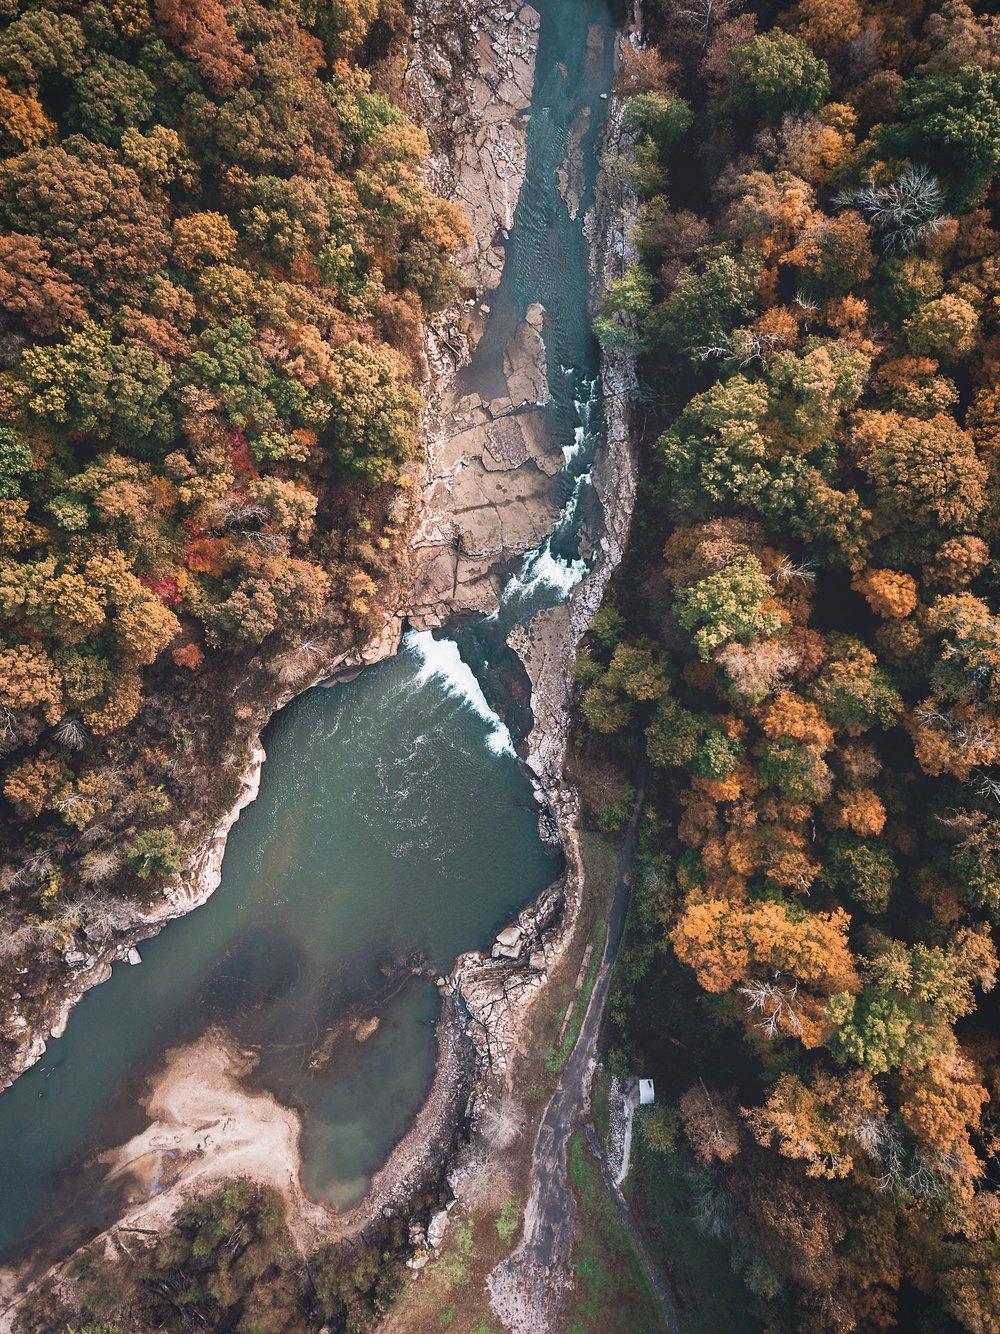 Cataract Falls Lower Falls Drone Shot.jpg